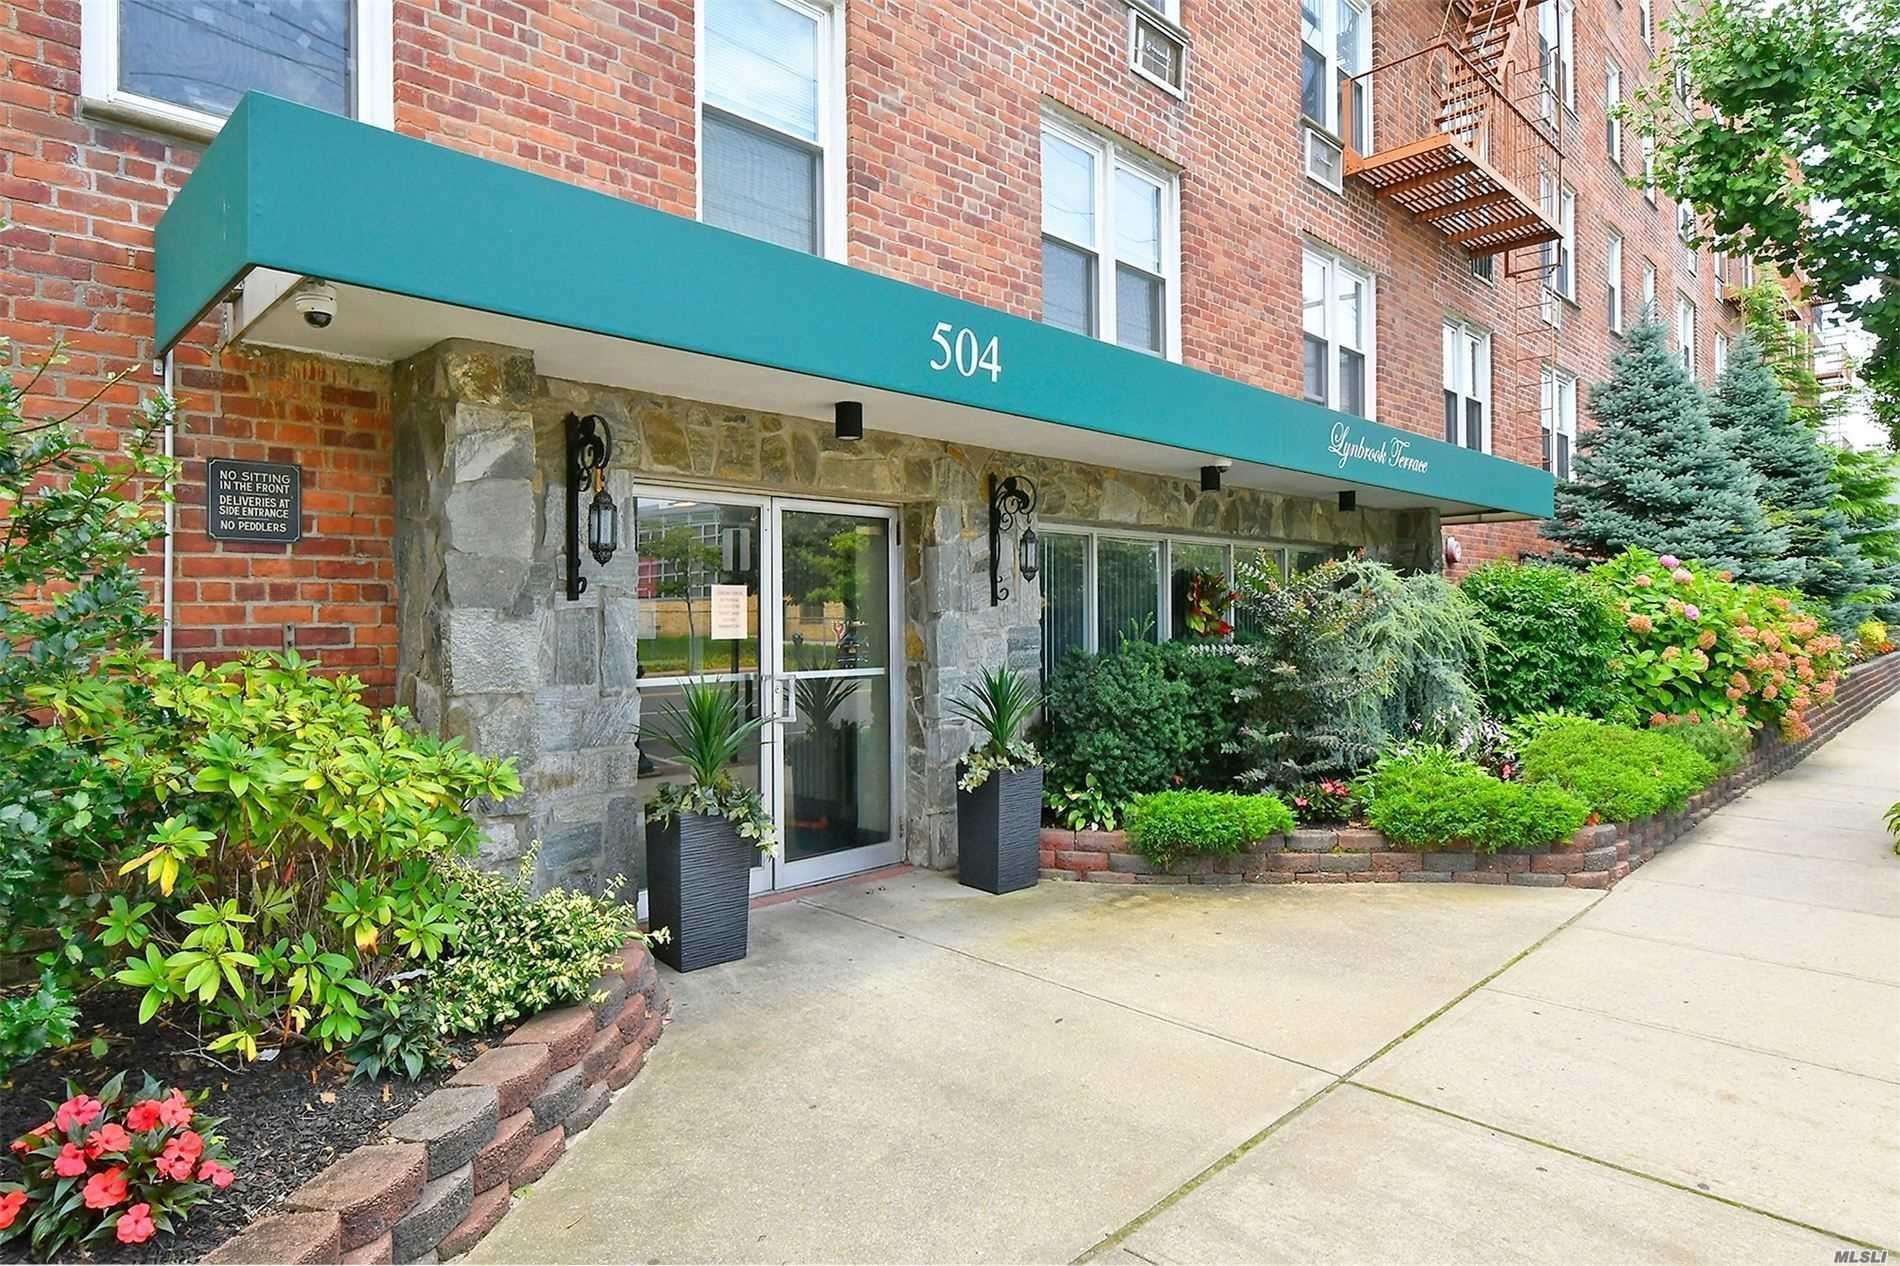 504 Merrick Road #1 J, Lynbrook, NY 11563 - MLS#: 3243256